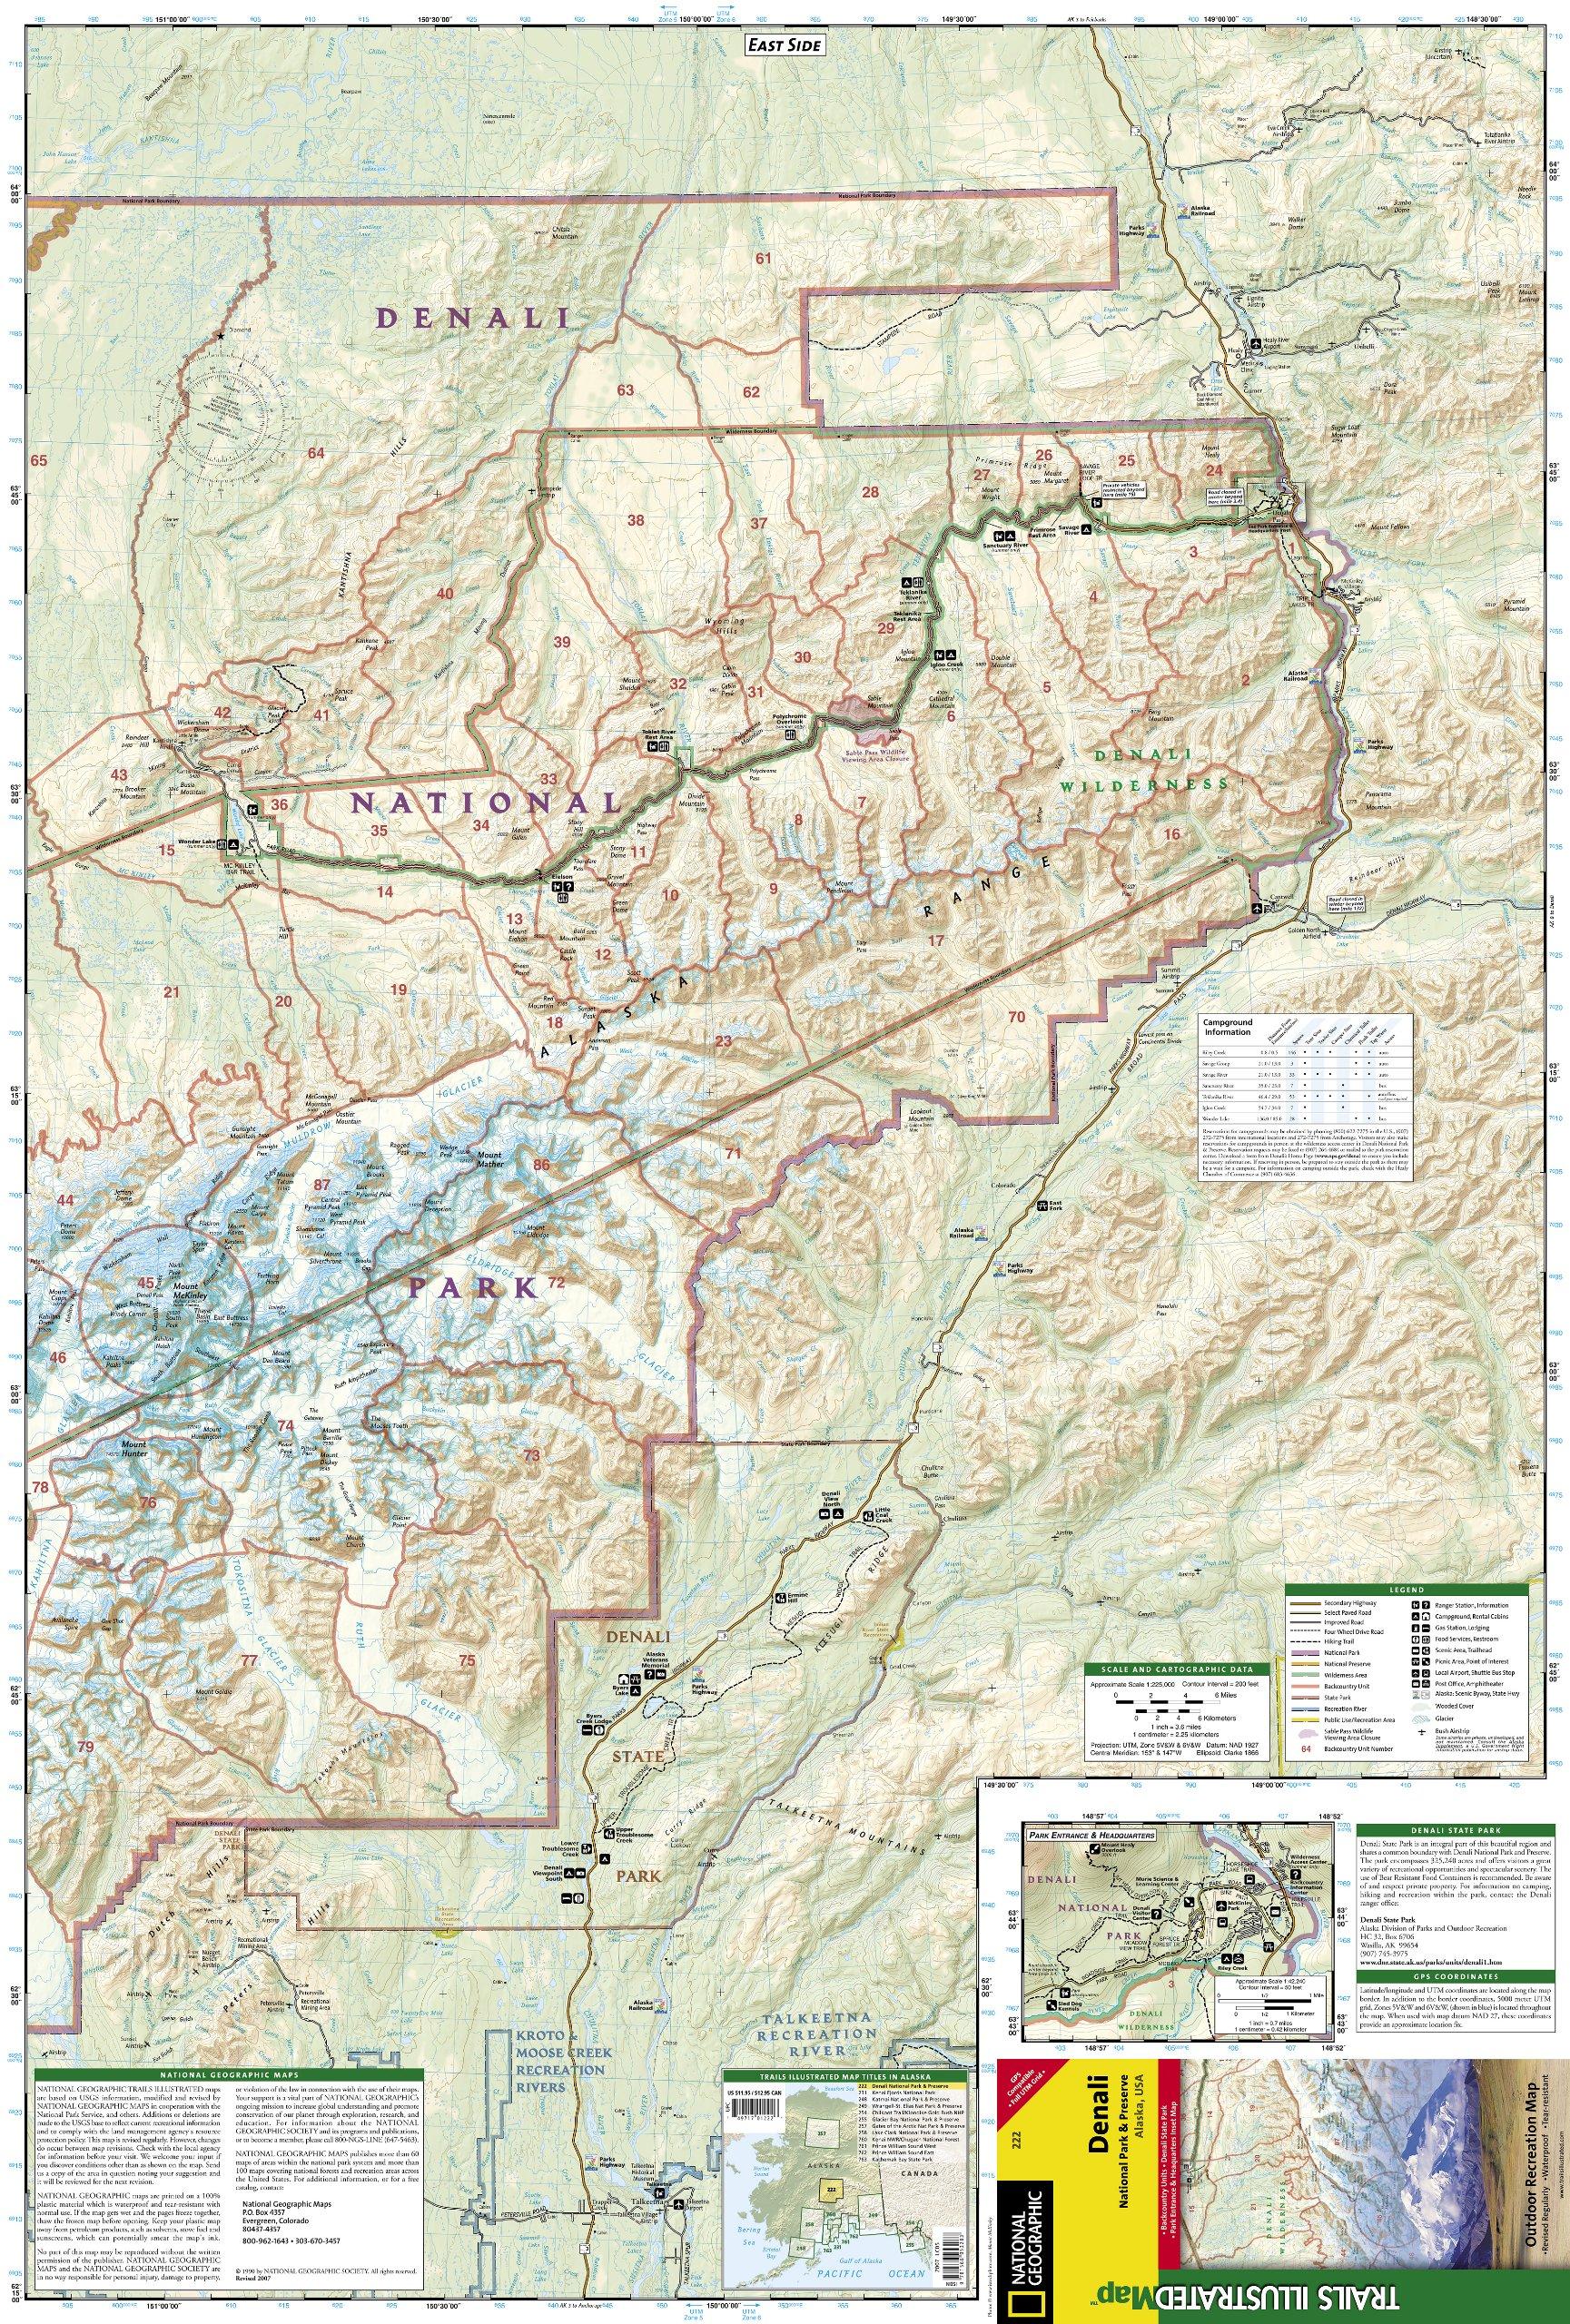 Denali National Park & Preserve: National Geographic Trails ... on